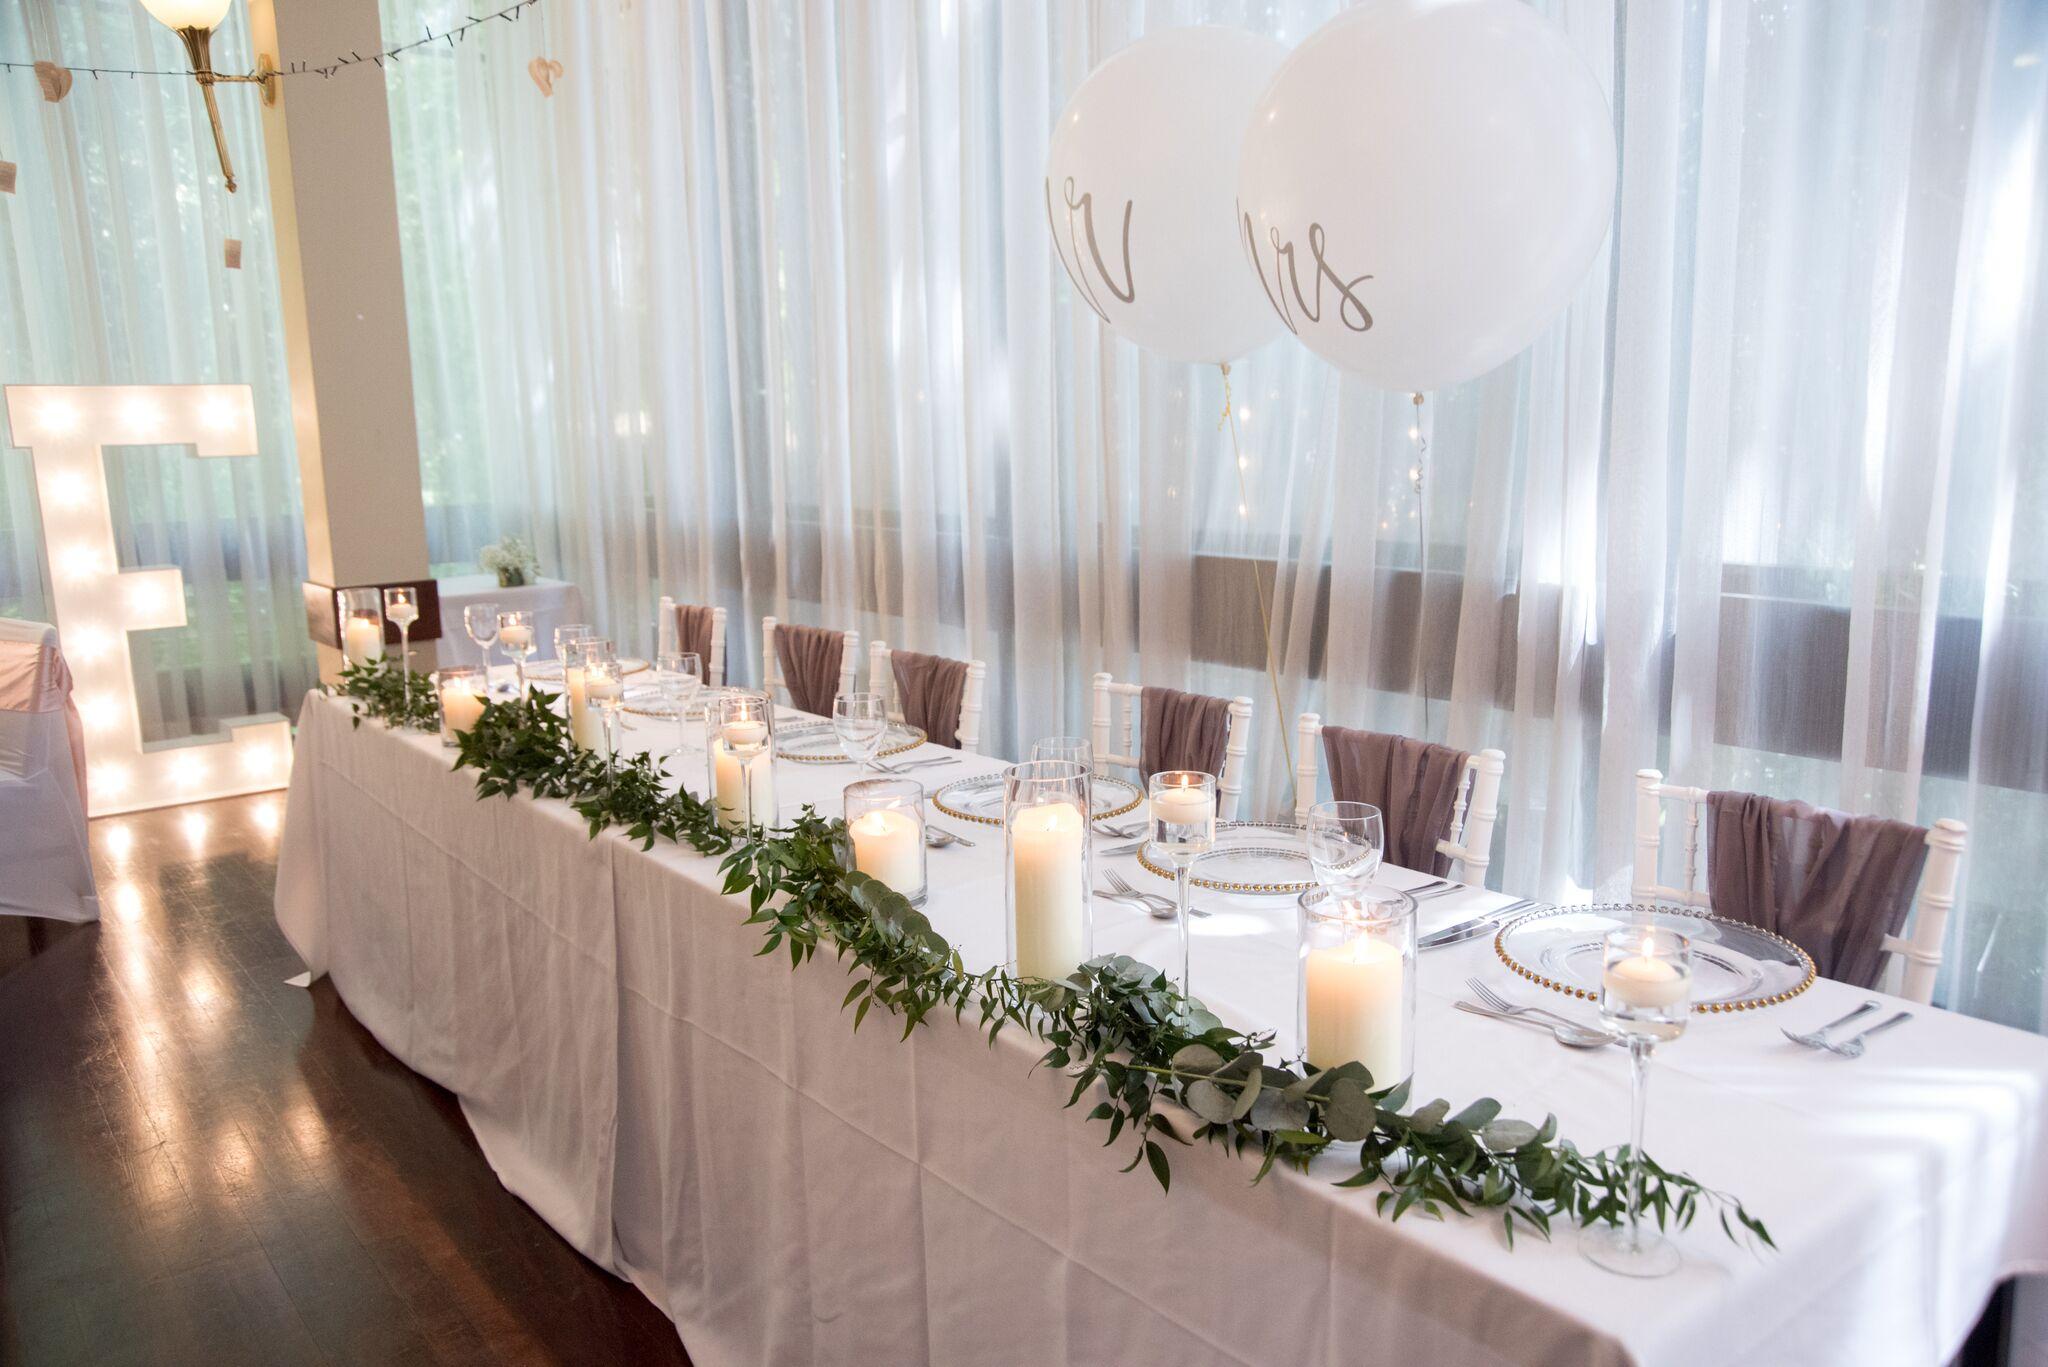 White Chiavari Chairs with mauve Chiffon Drop Sash Sophia's Final Touch - Venue Styling - Weddings